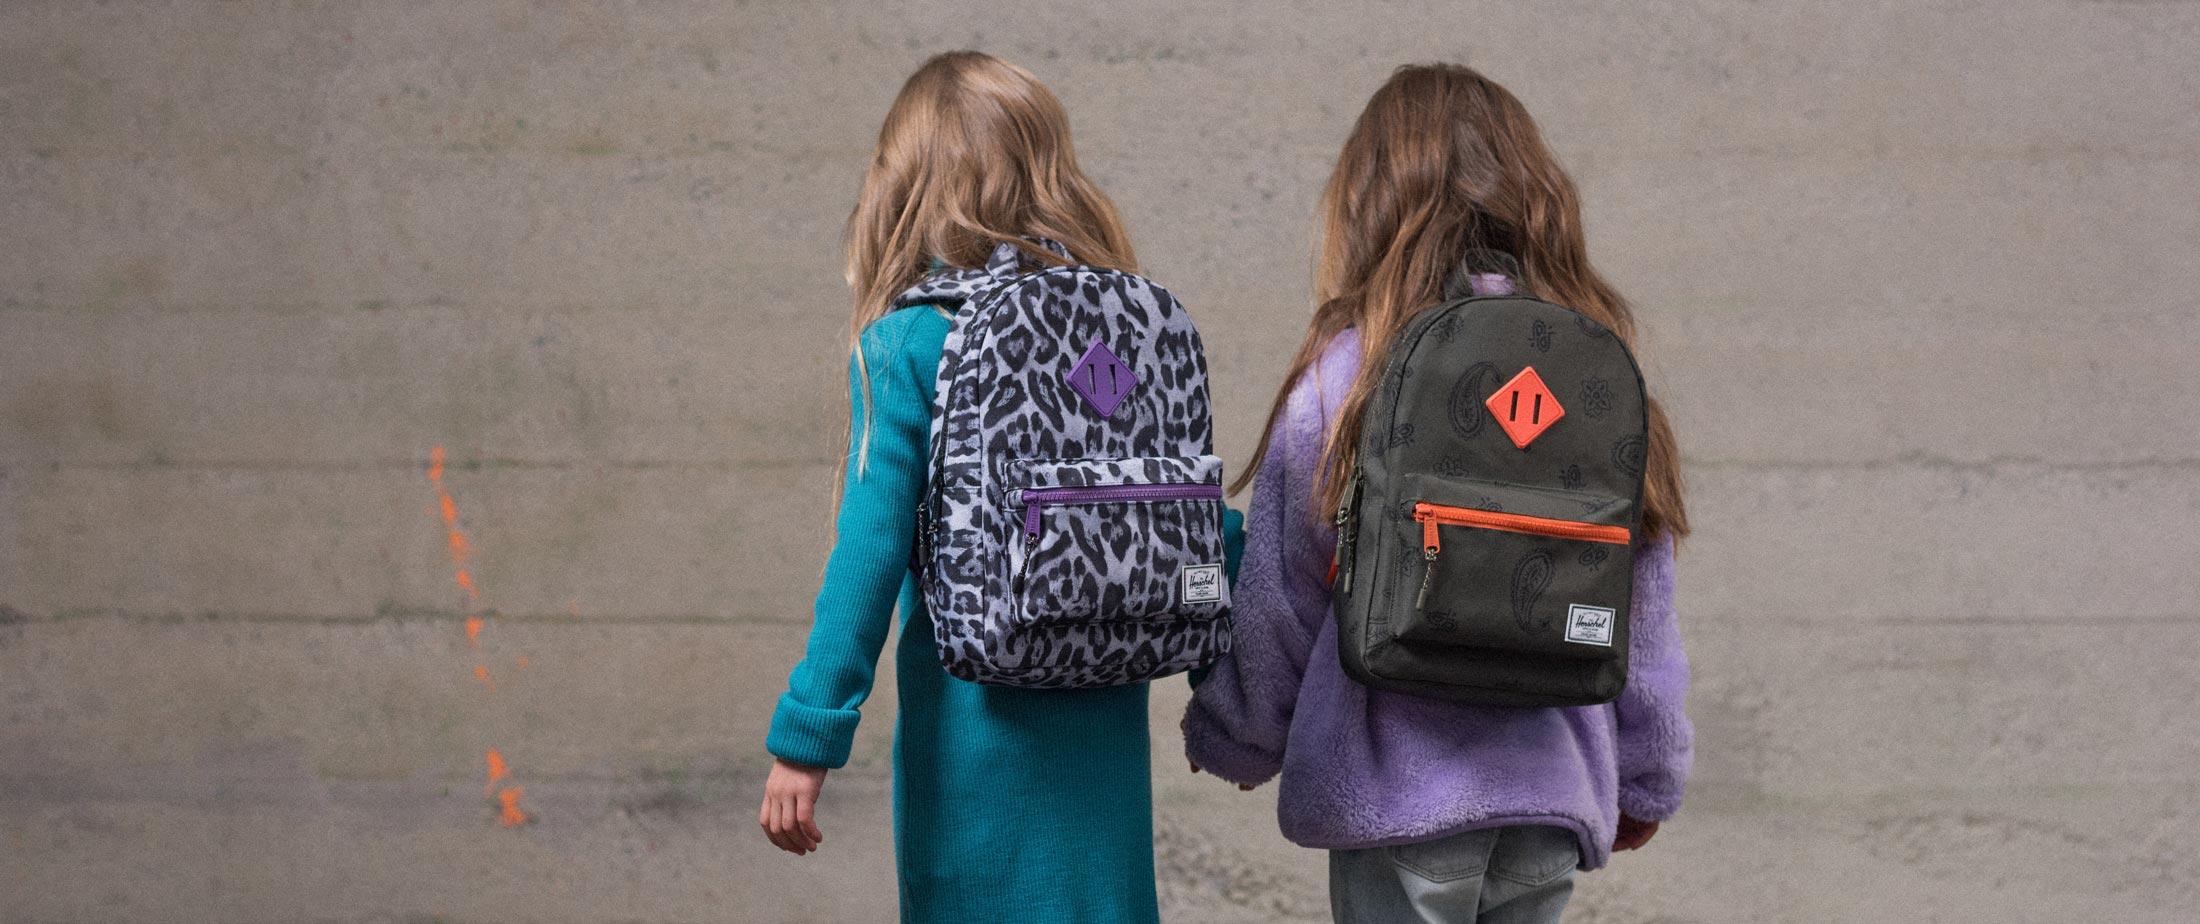 Kids Backpacks Duffle Bags And Jackets Herschel Supply Company Tas Wanita Hand Bag Ssf0686